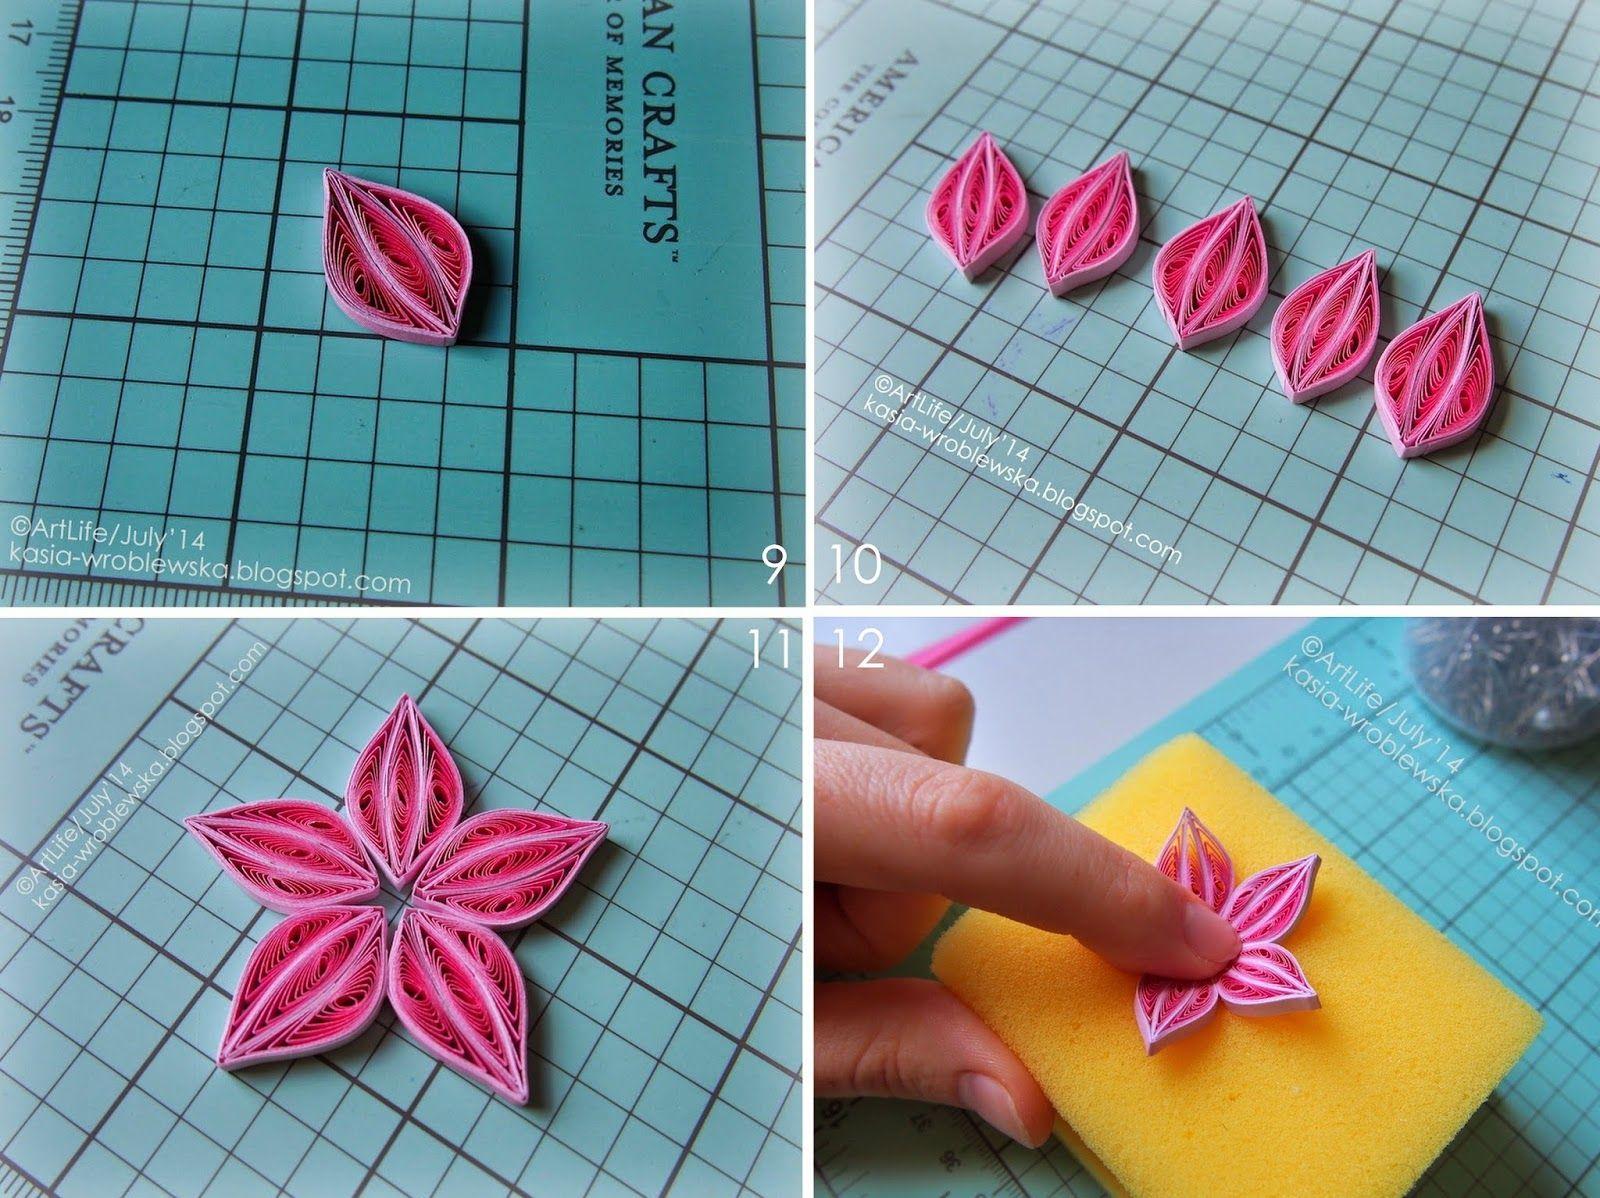 Artlife Clematis Flower Tutorial Master Klass Klematis Paper Quilling Patterns Quilling Designs Quilling Flowers Tutorial